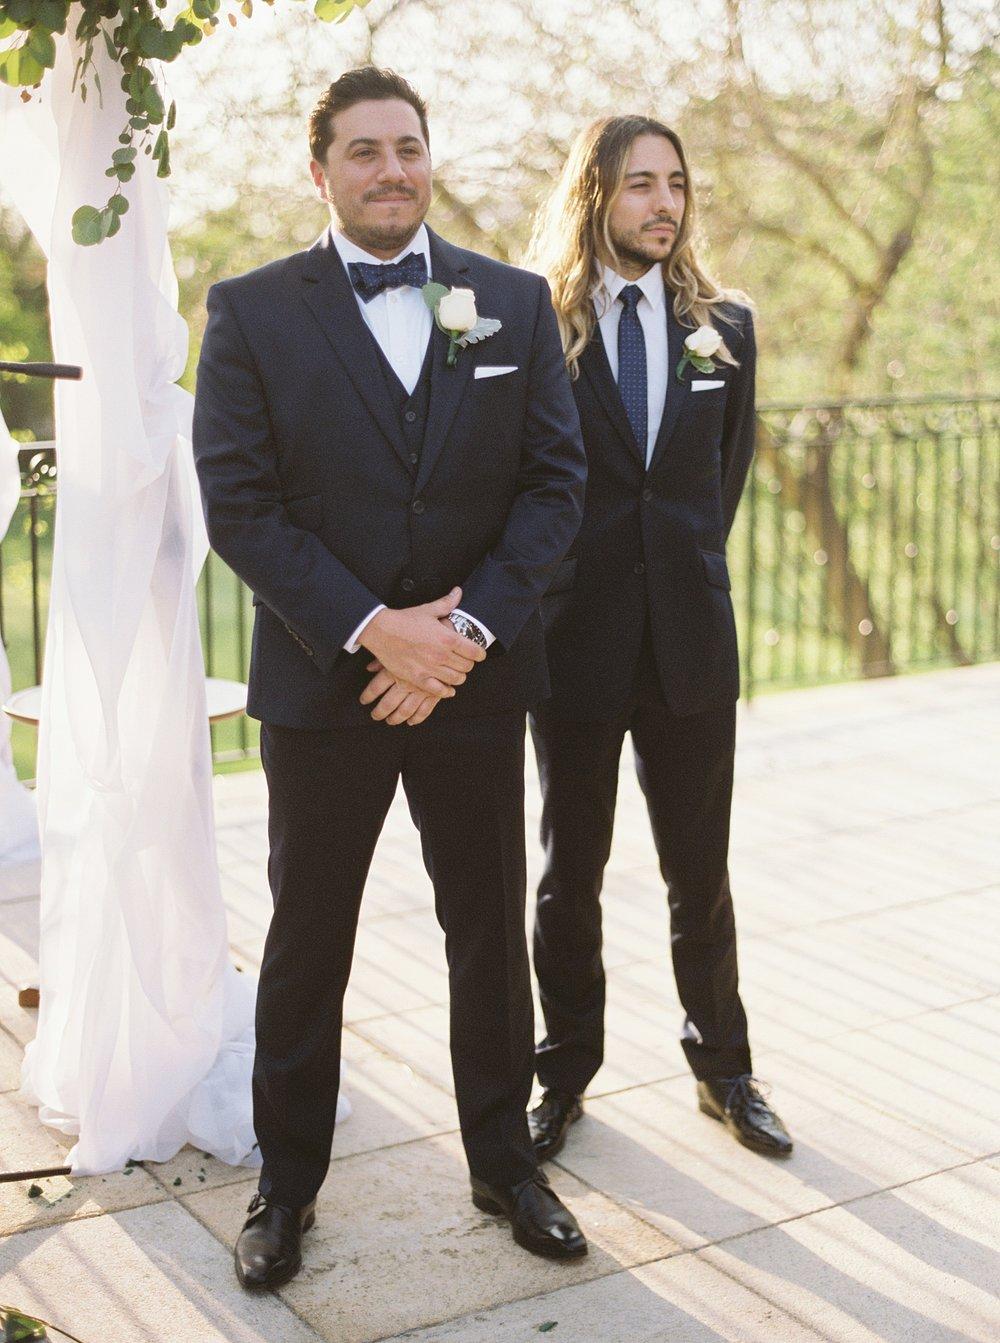 westchester_new_york_wedding_0053.jpg